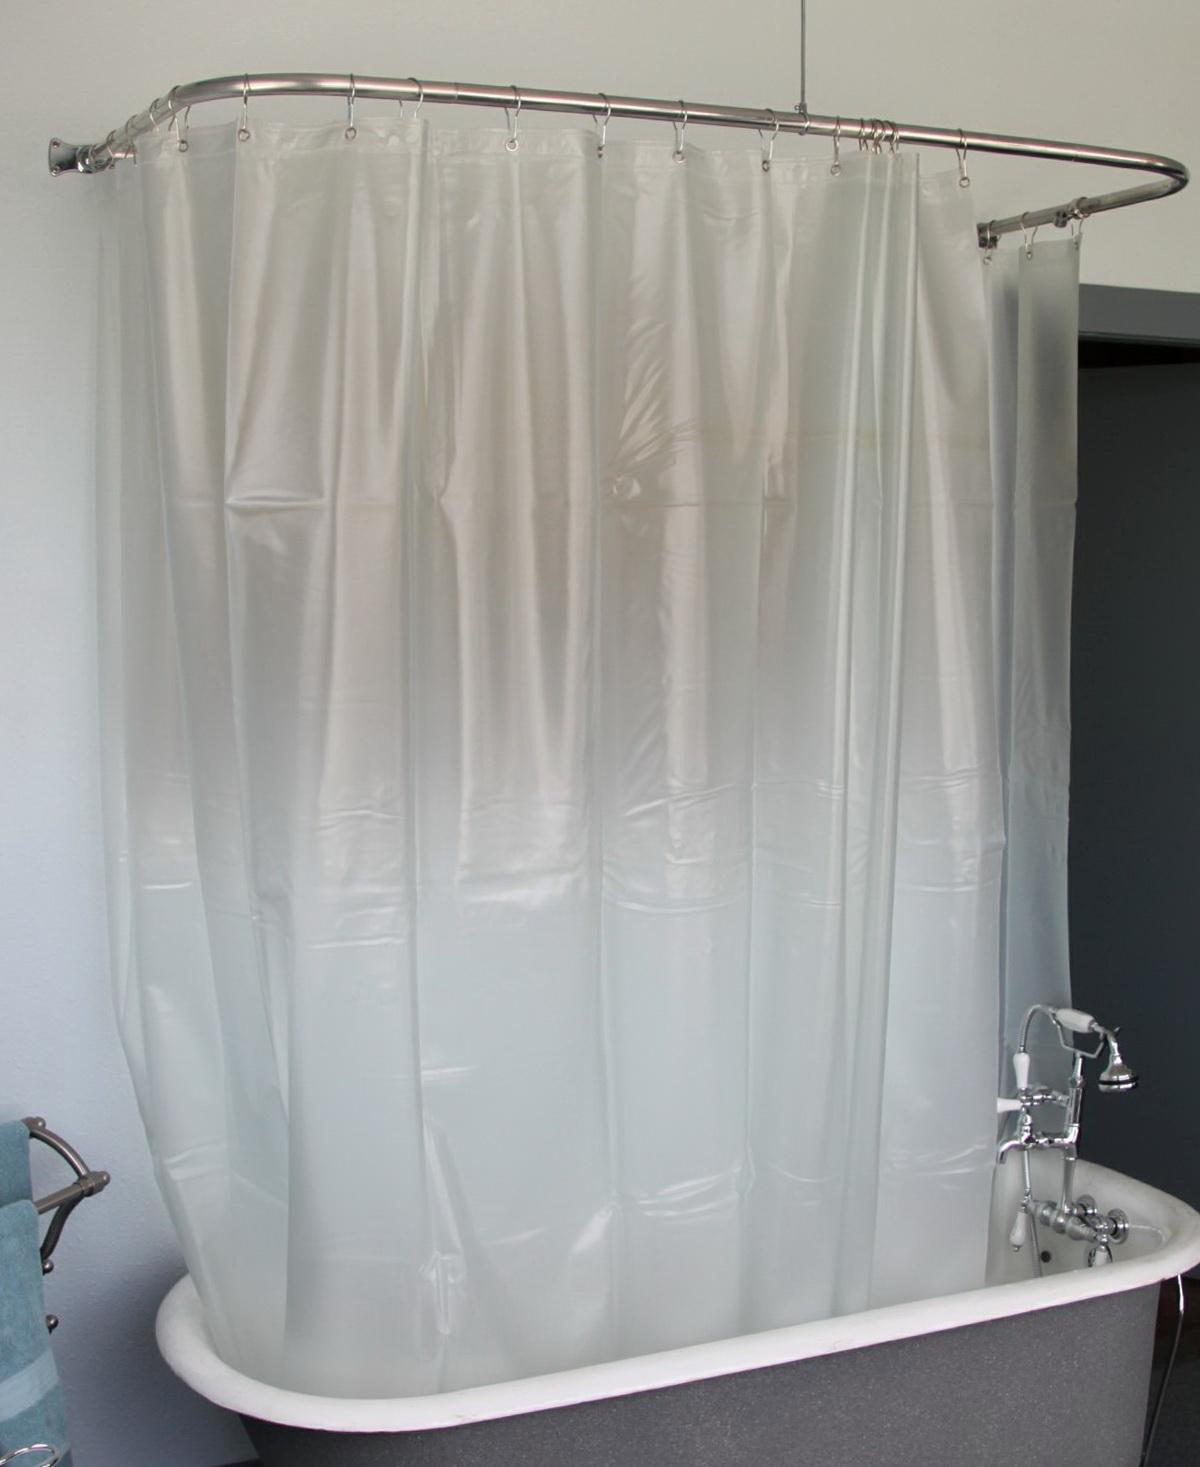 Commercial Shower Curtains Uk Home Design Ideas